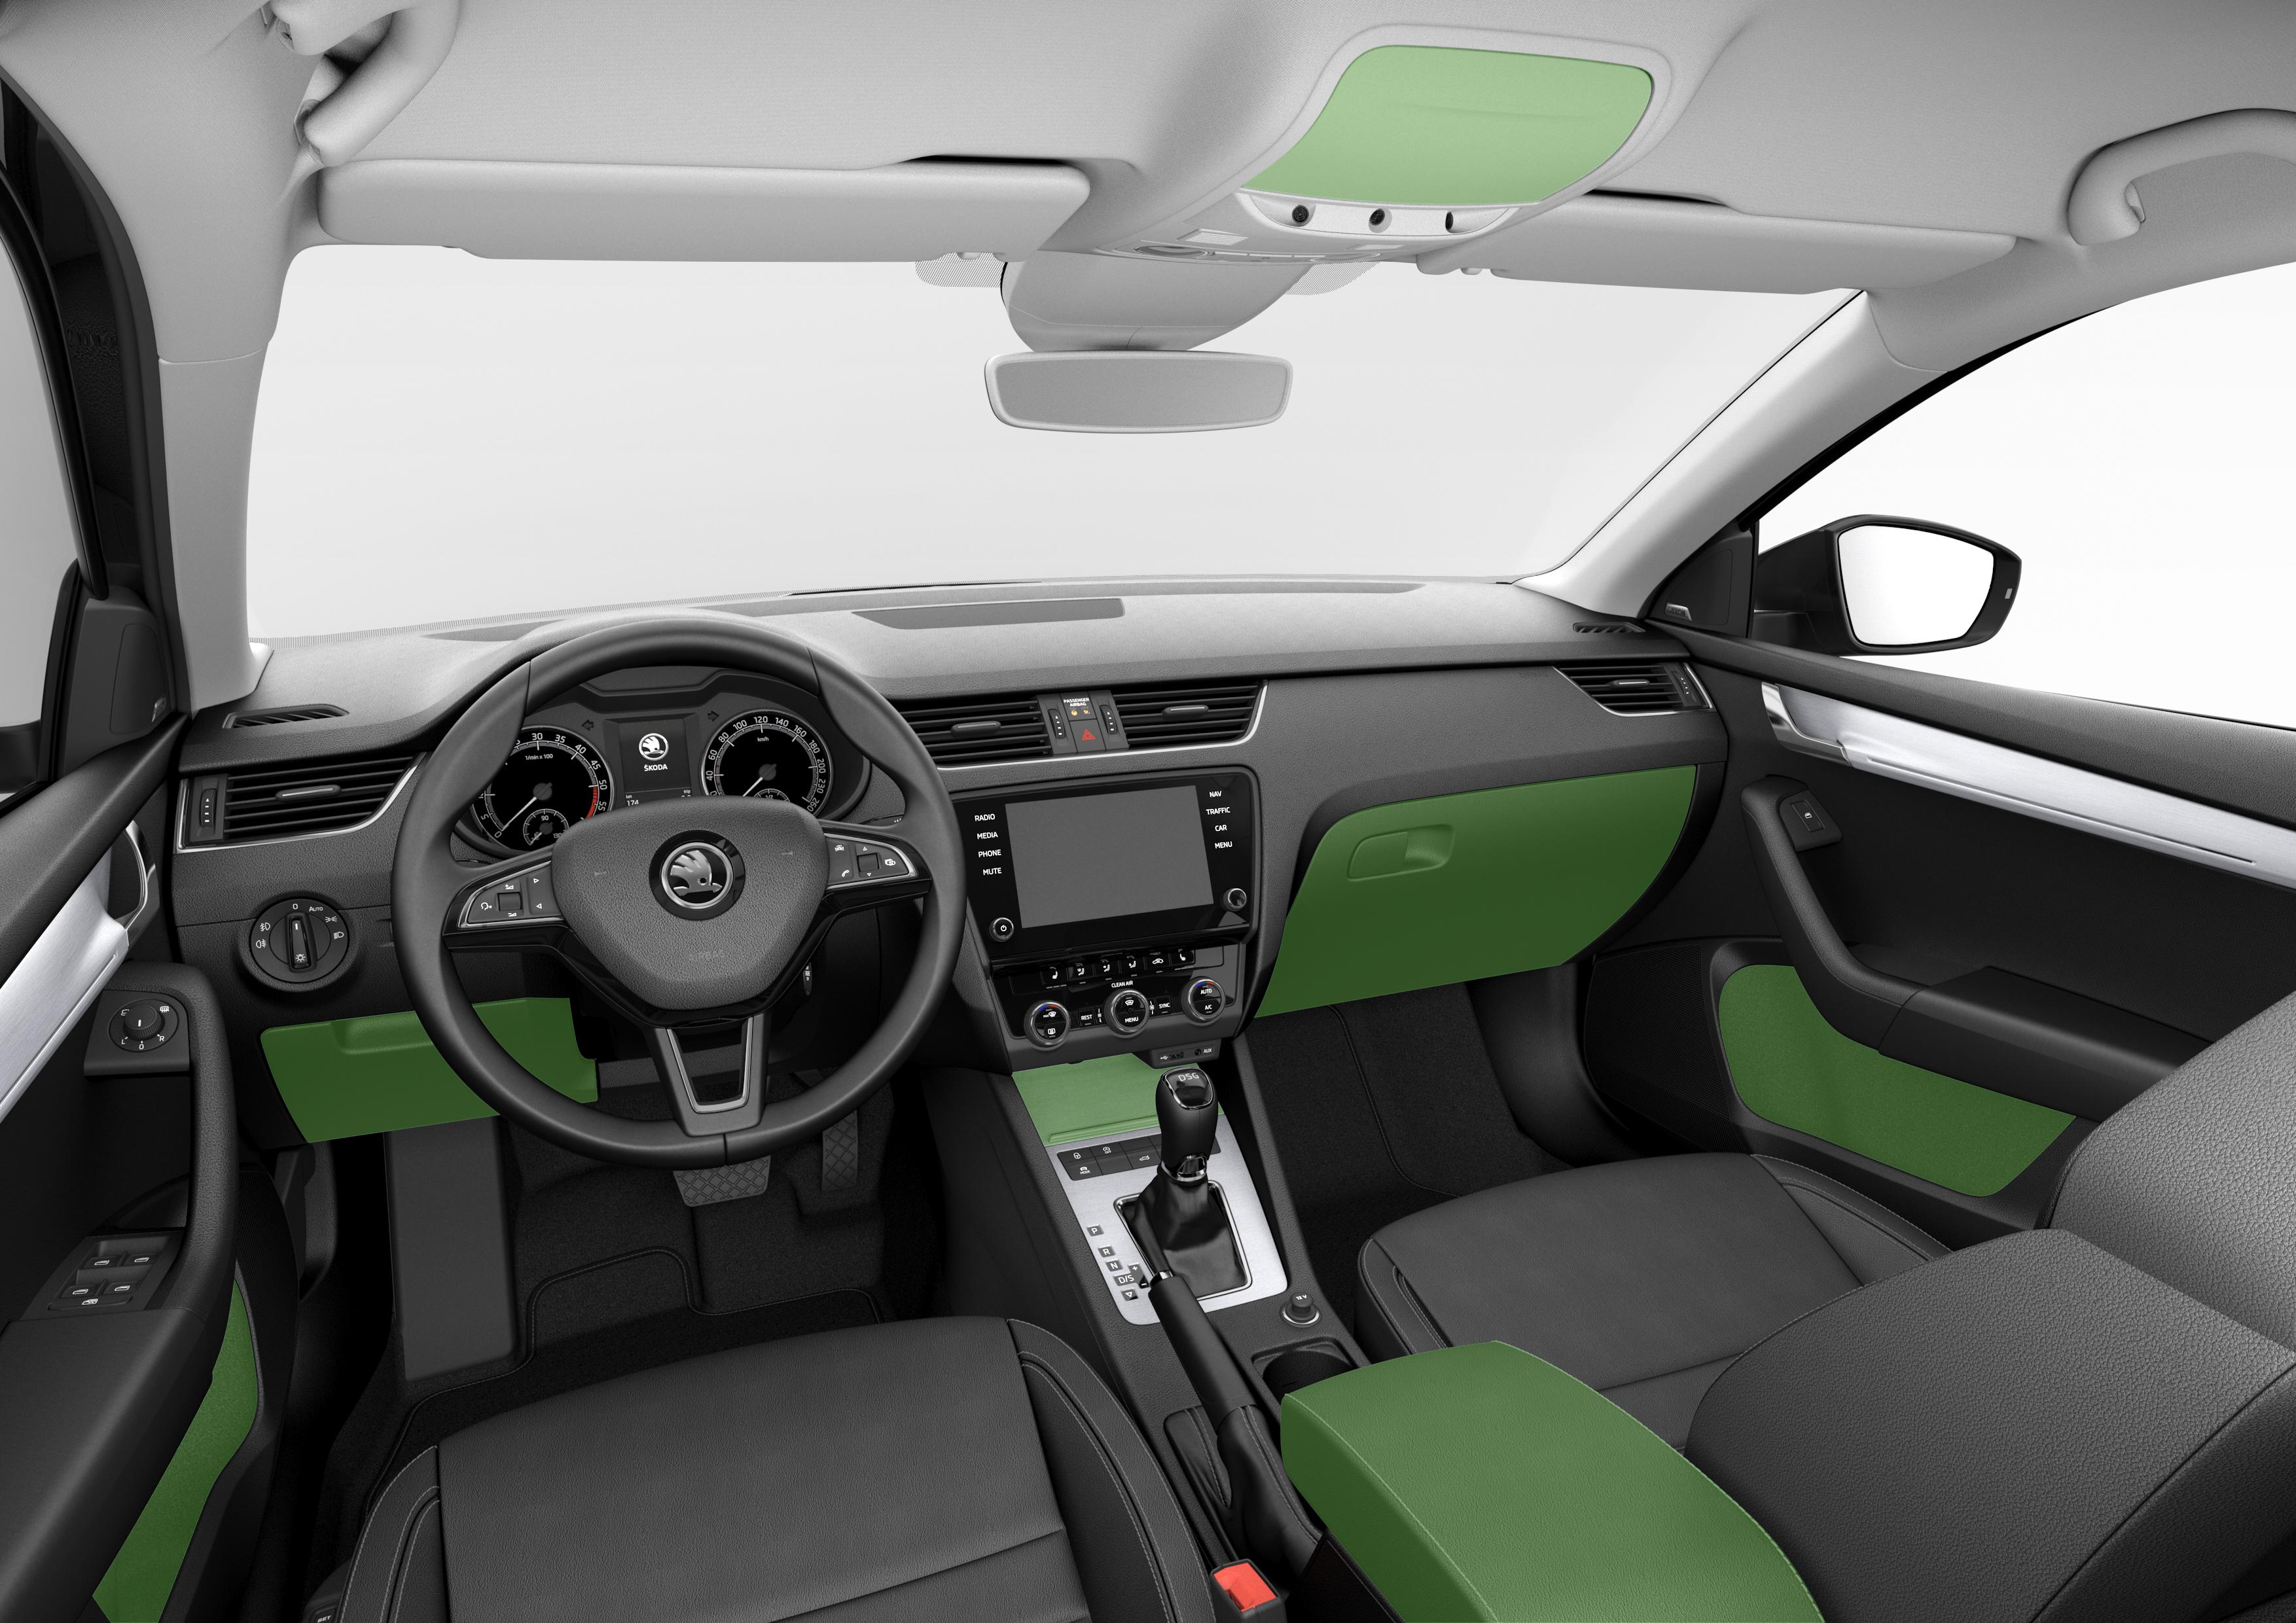 Koda Octavia Bestseller In New Top Shape Following Comprehensive Skoda Steering Wheel Wiring Diagram Show More Less